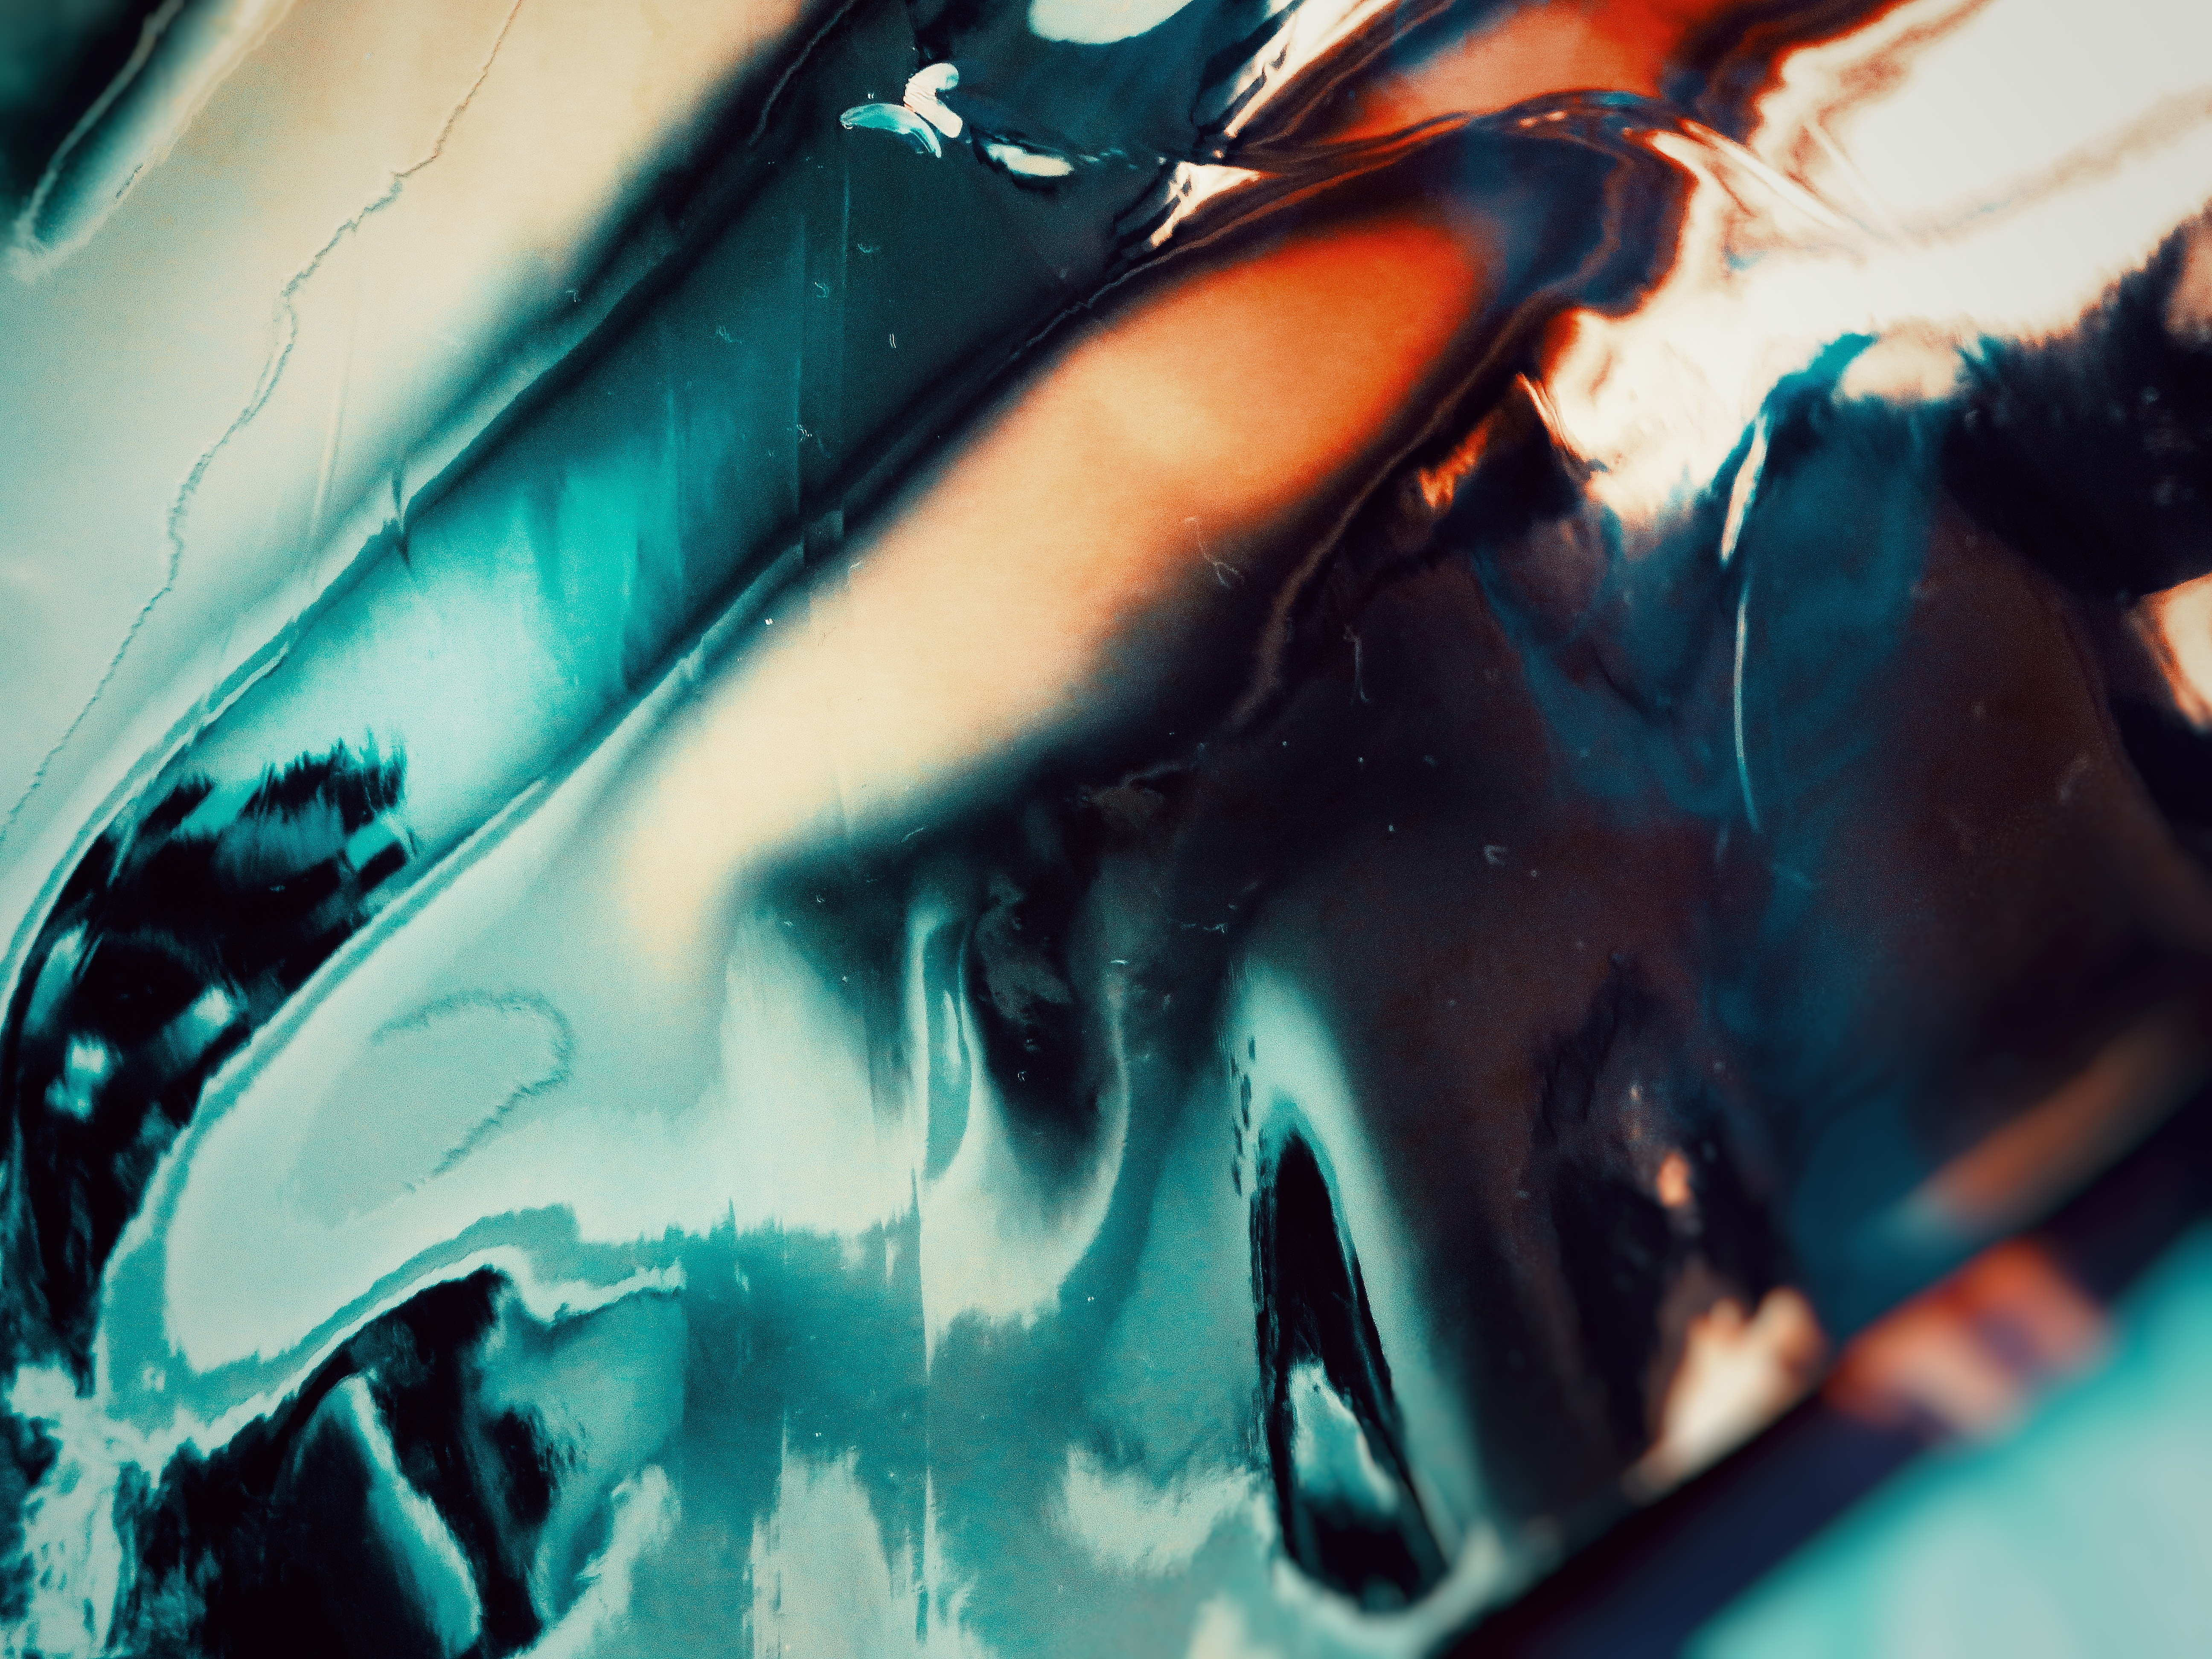 Close-up Photo of Blue Liquid